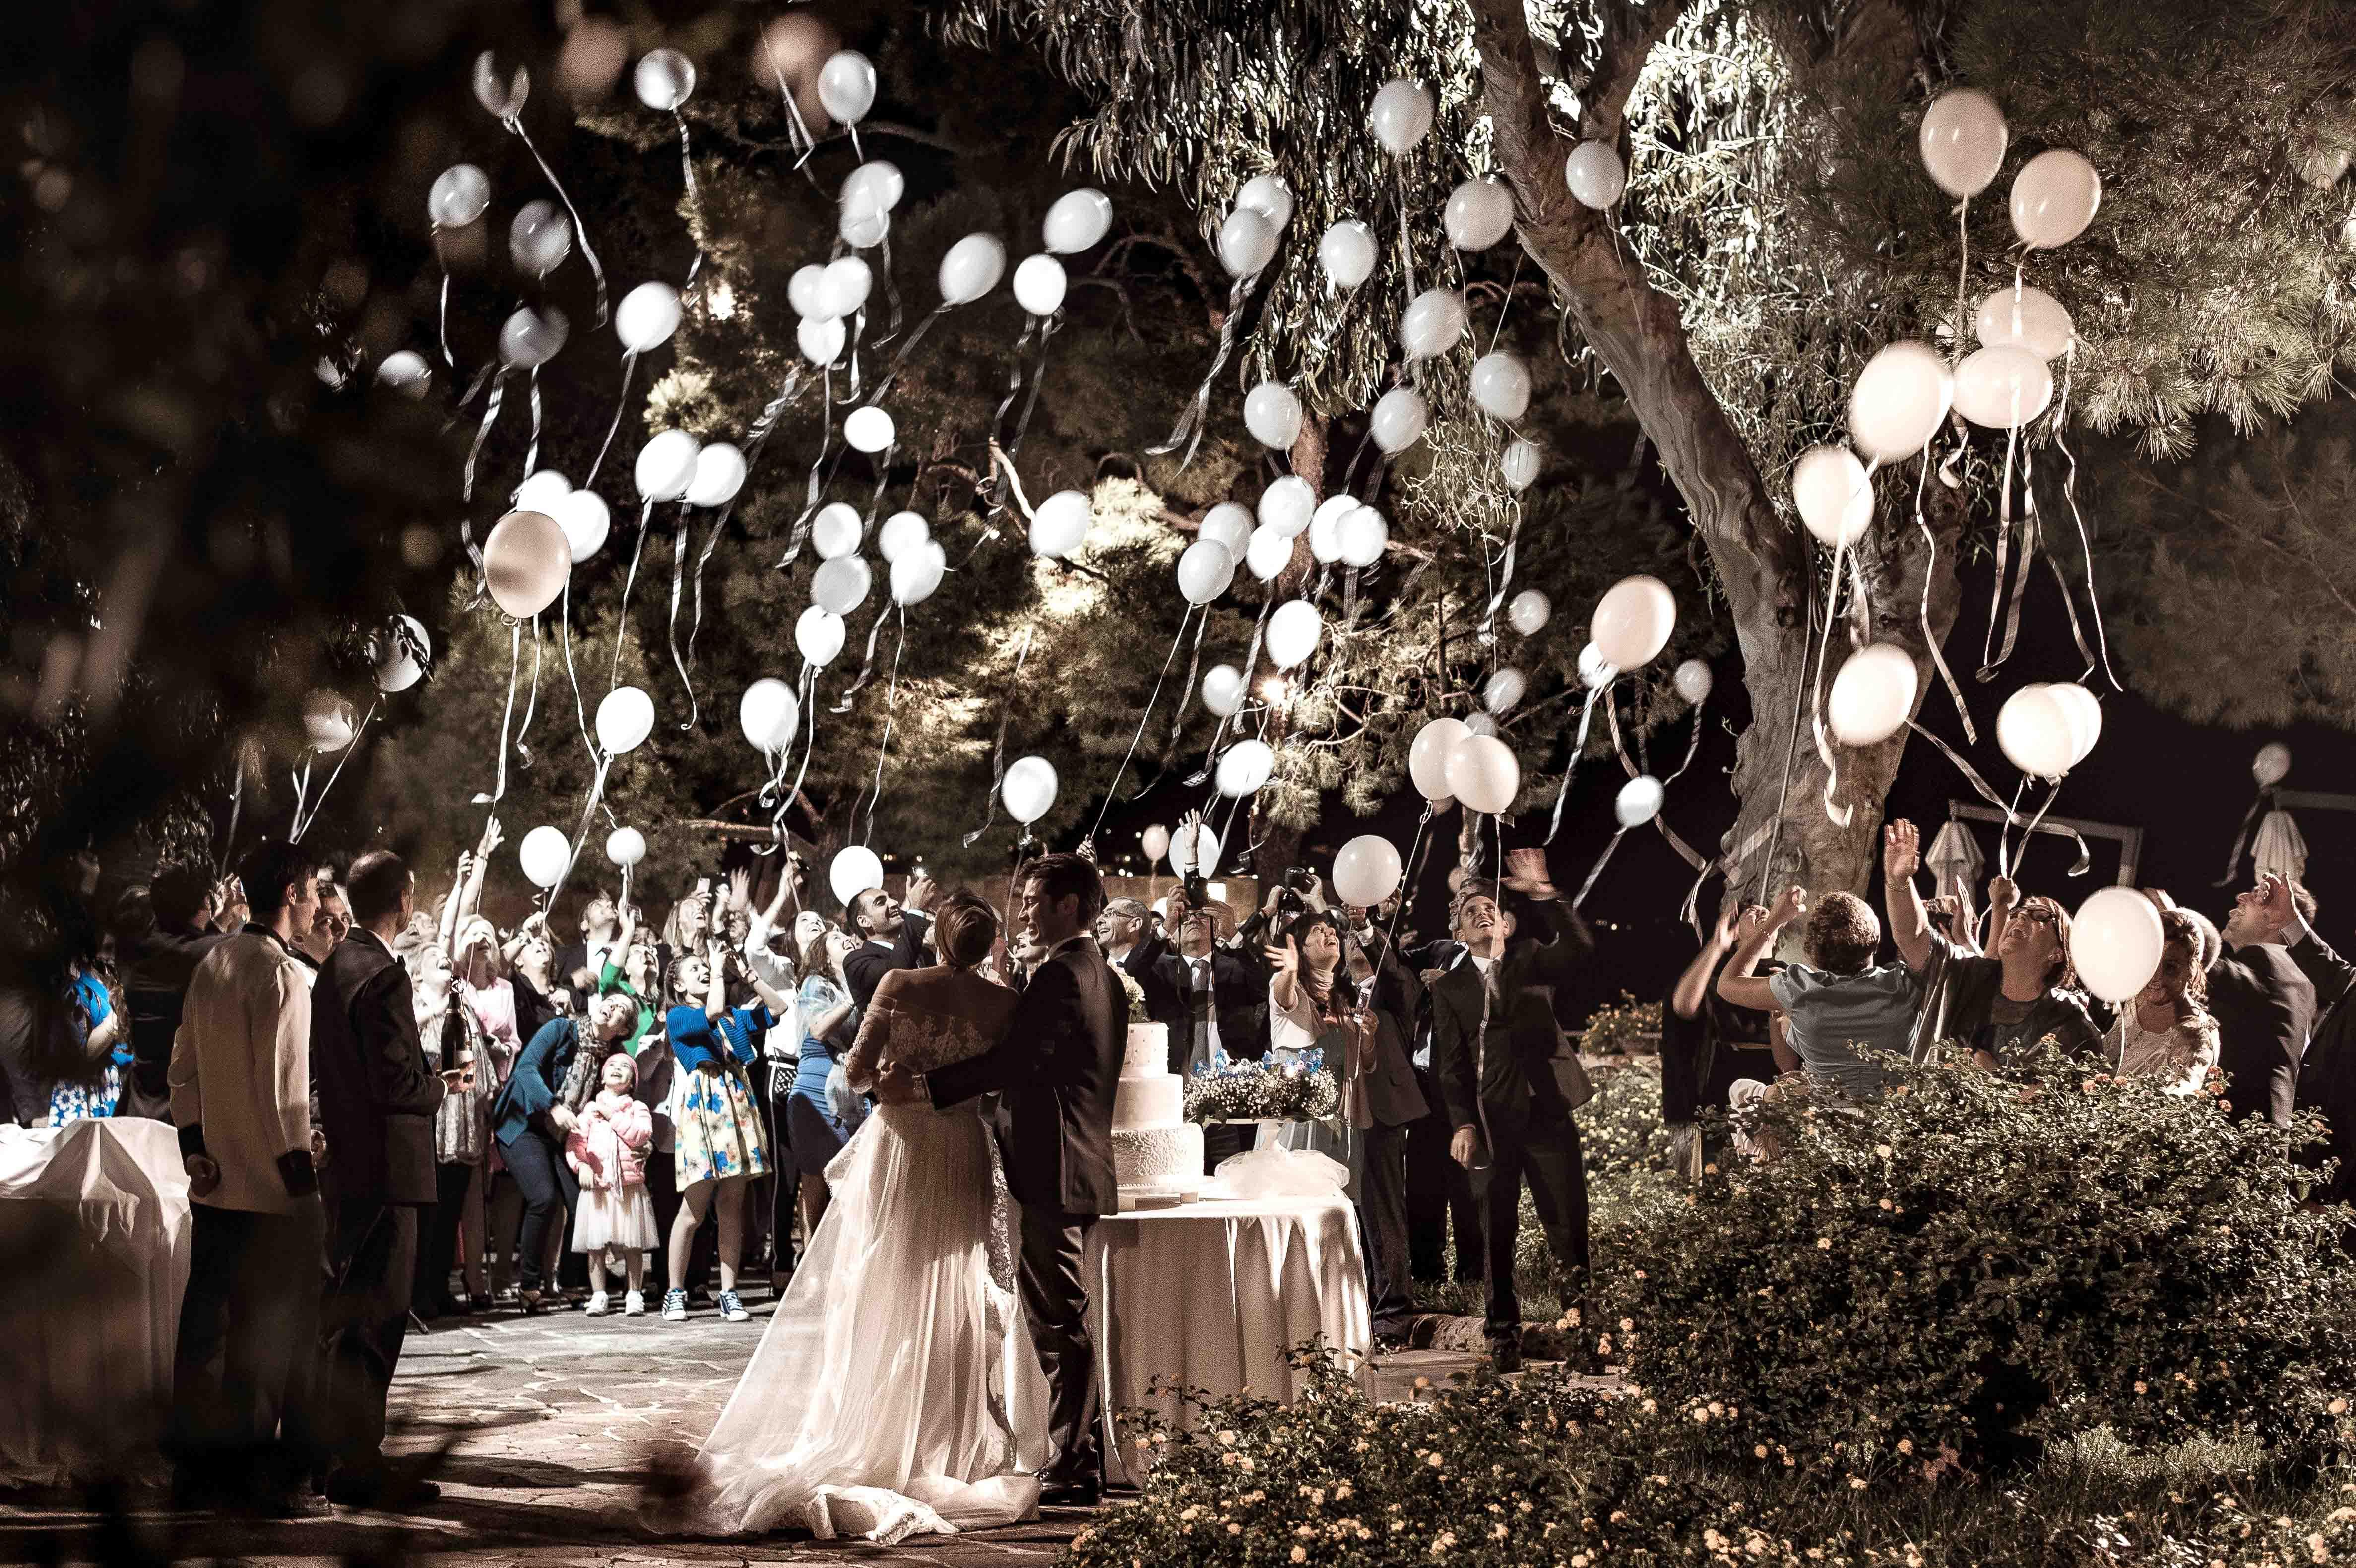 Fotografo Cava Dei Tirreni fotografo matrimonio sorrento | pasquale passaro wedding